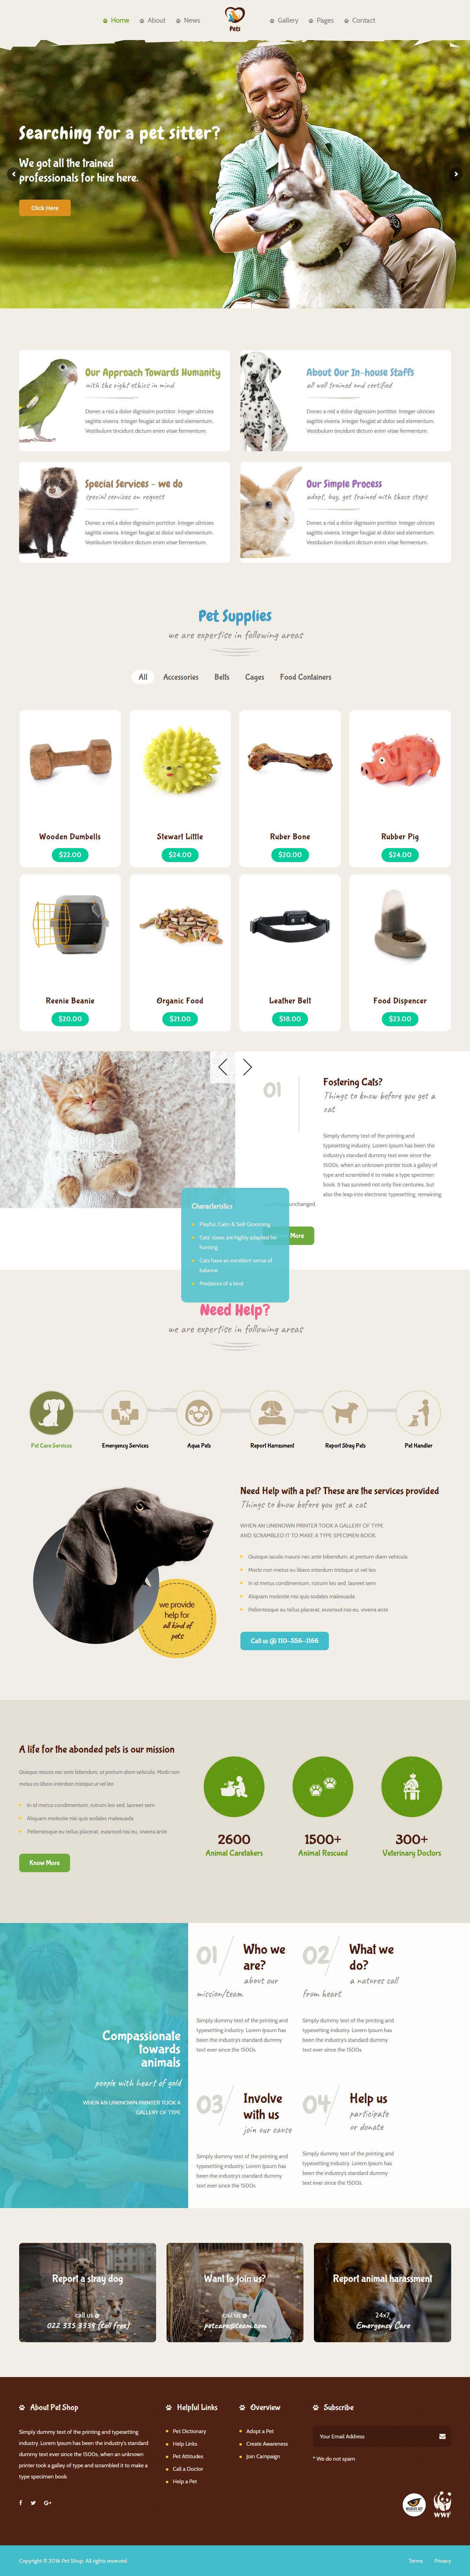 pet world best premium animal and pet wordpress theme - 10+ Best Premium Animal and Pet WordPress Themes